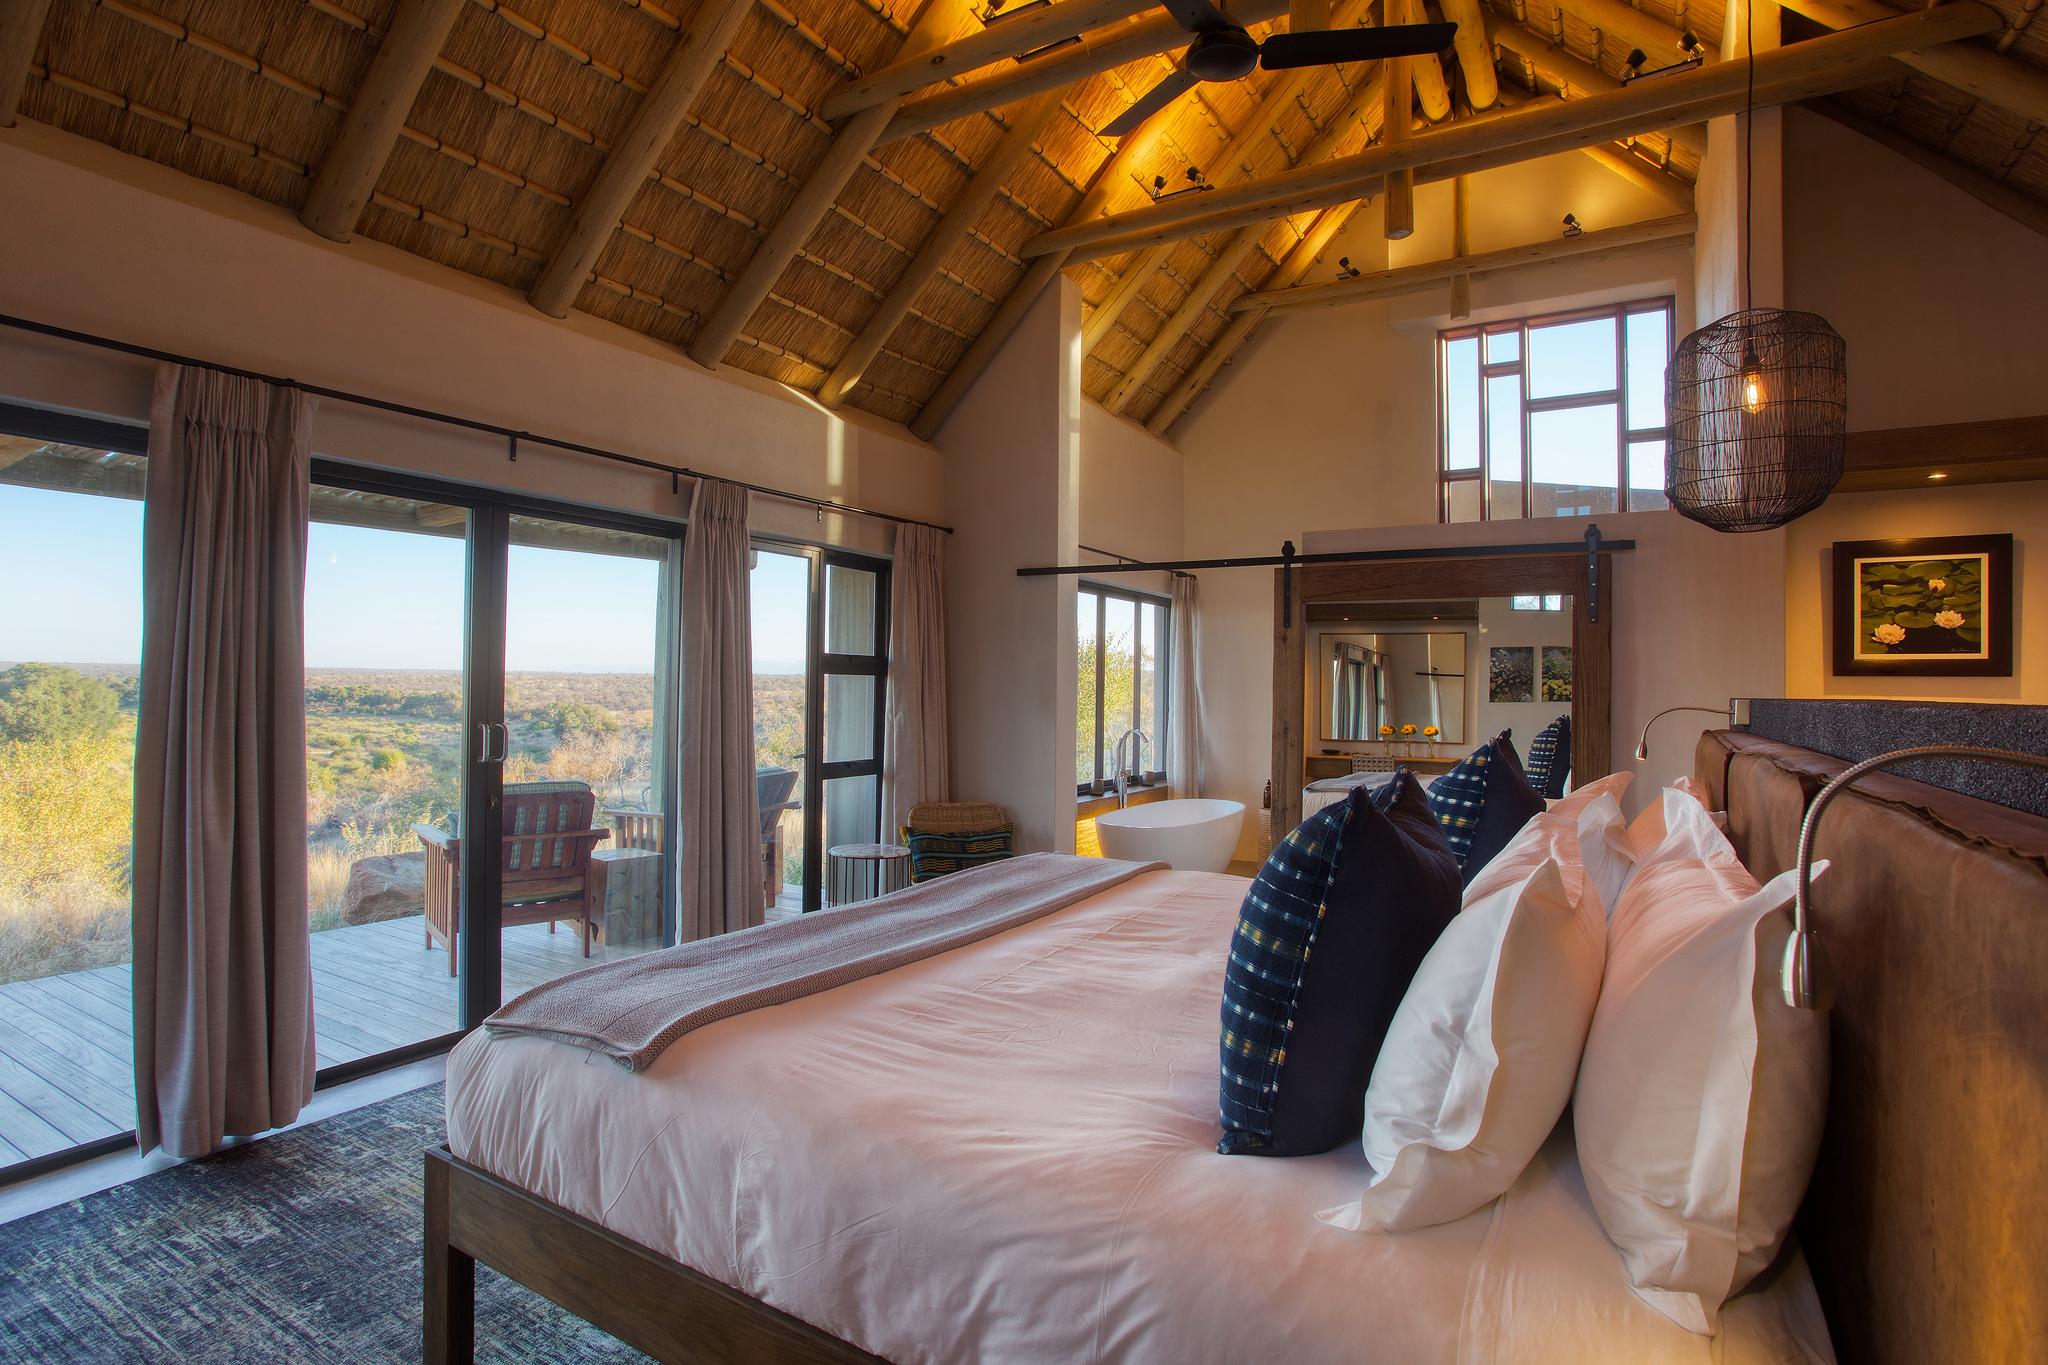 Misava Room Interior with View